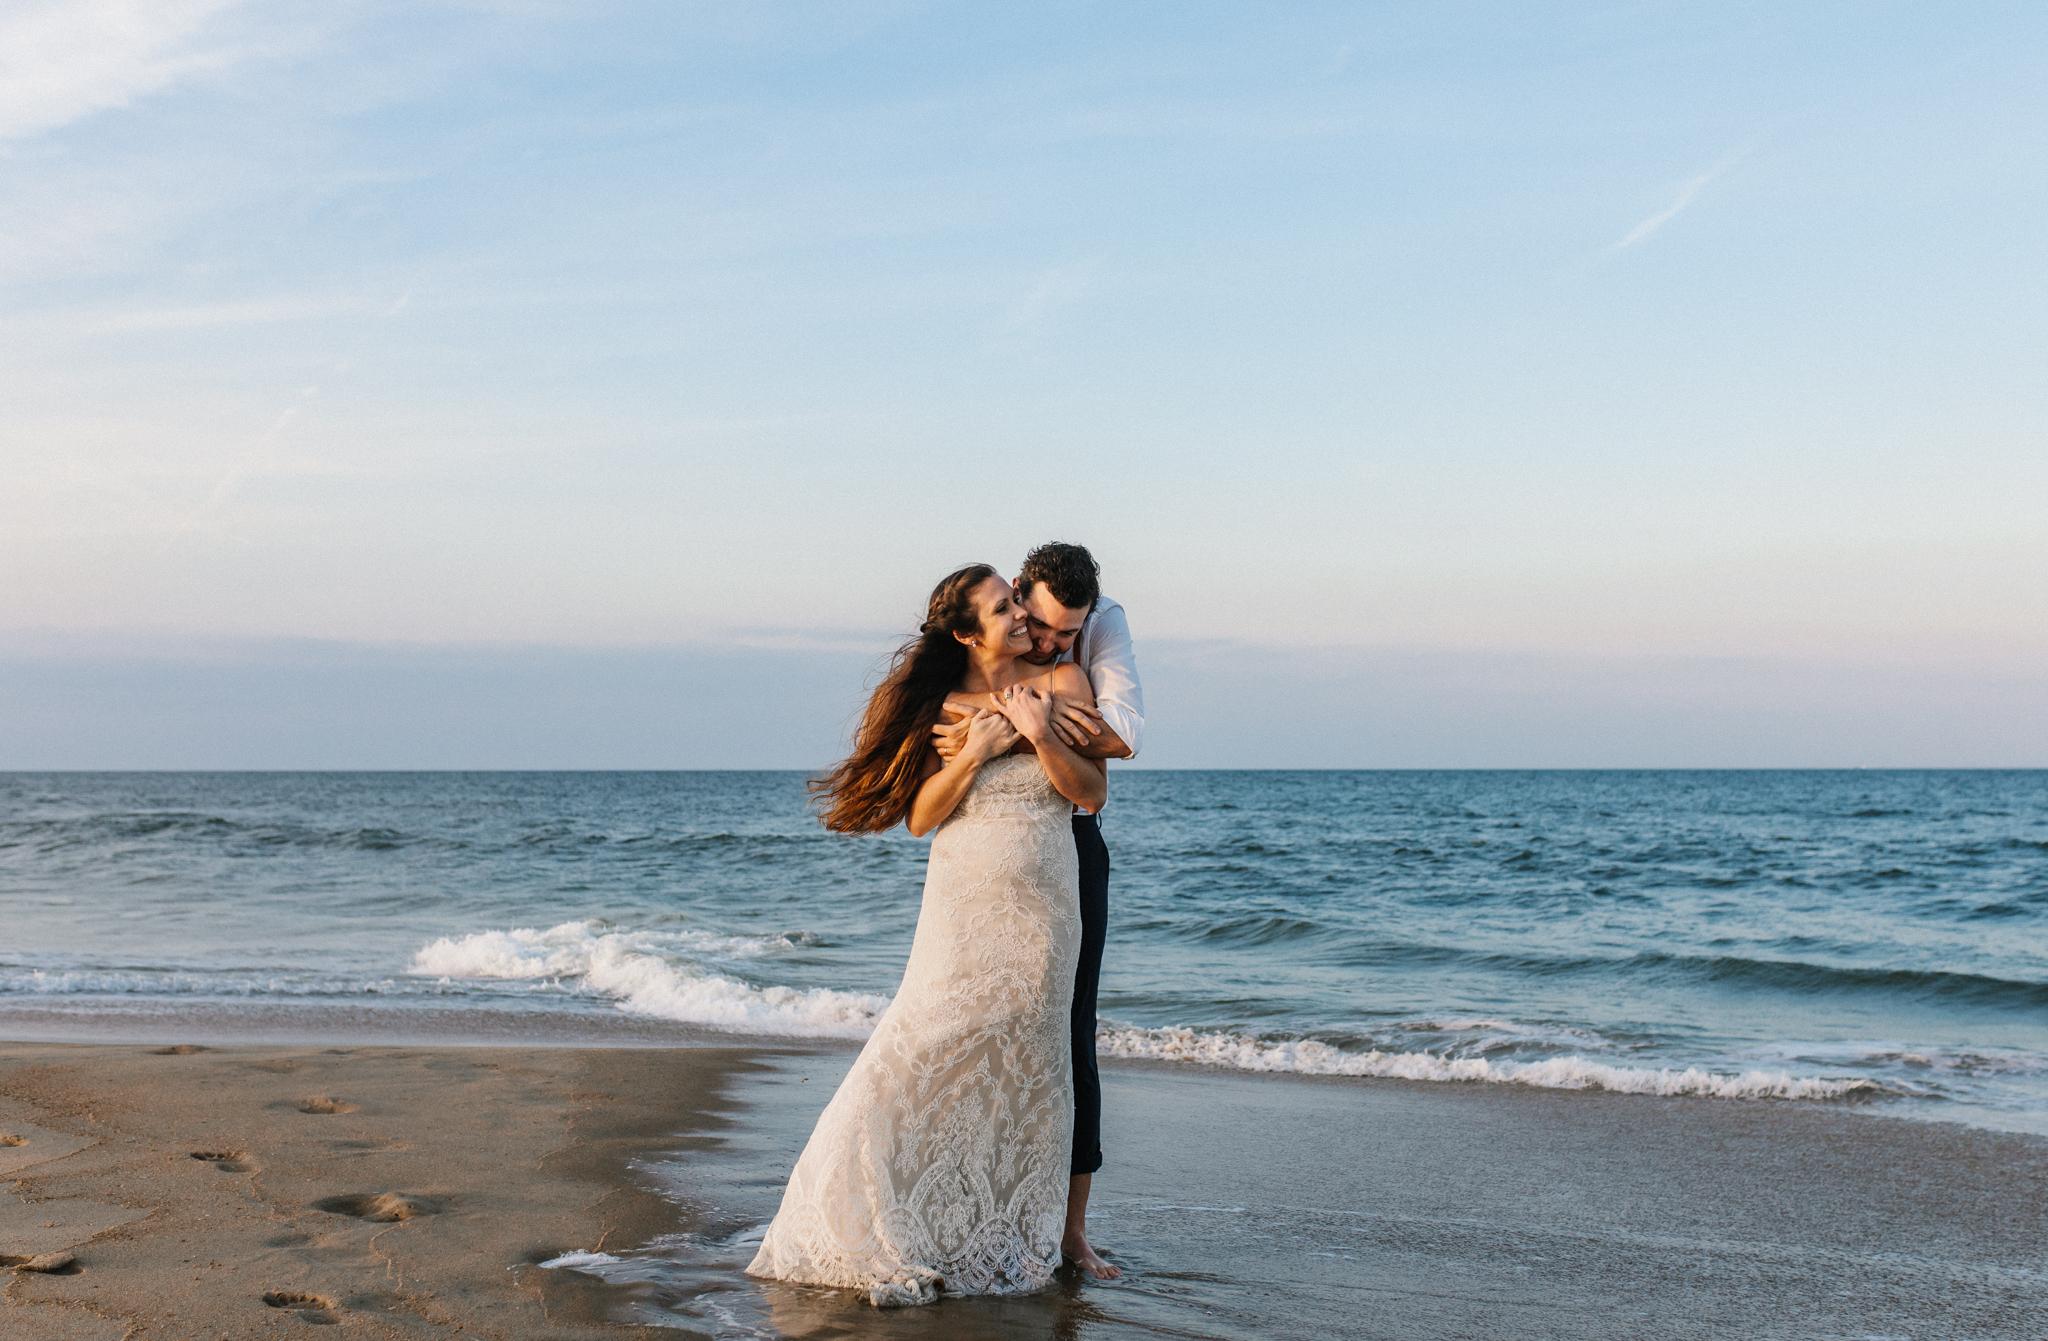 anniversary_virginia_beach_oceanfront_rebeccaburtphotography-64.jpg